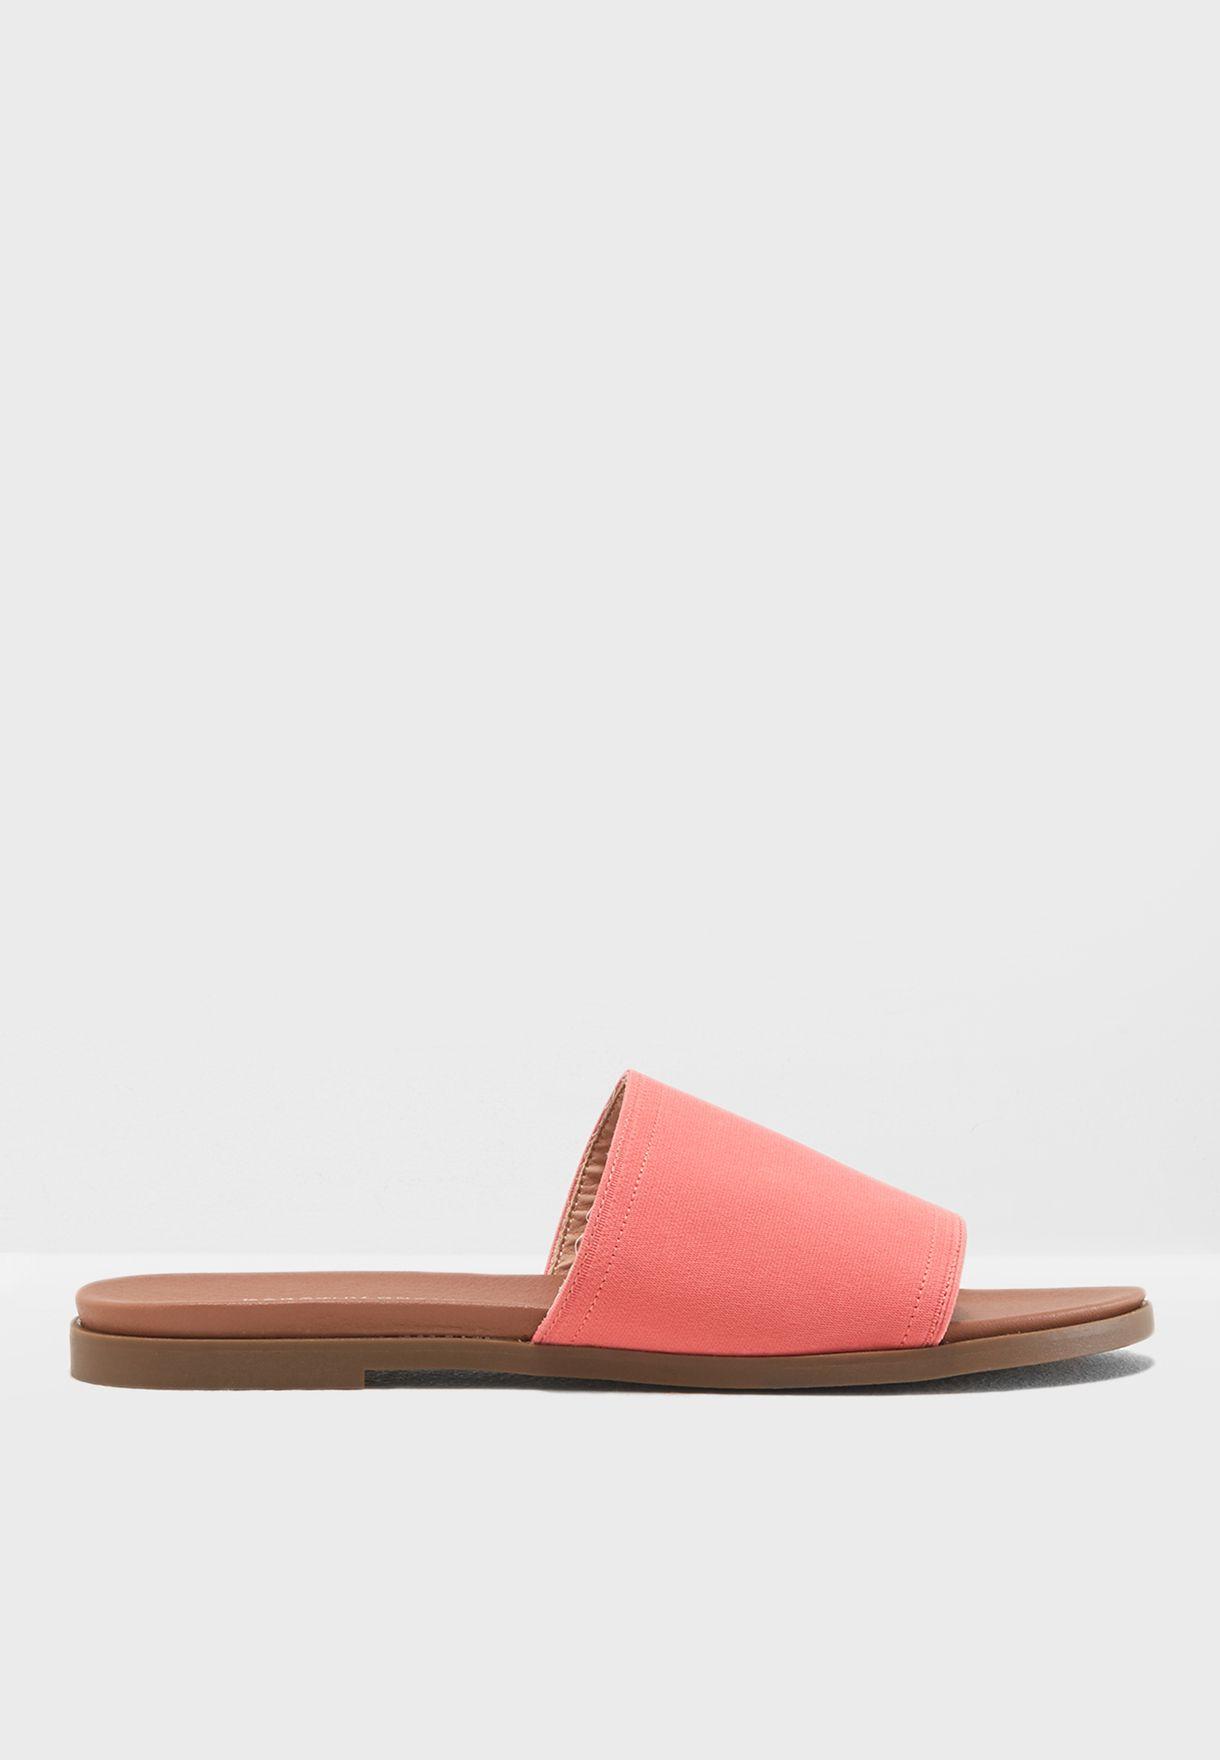 Flame Mule Sandal